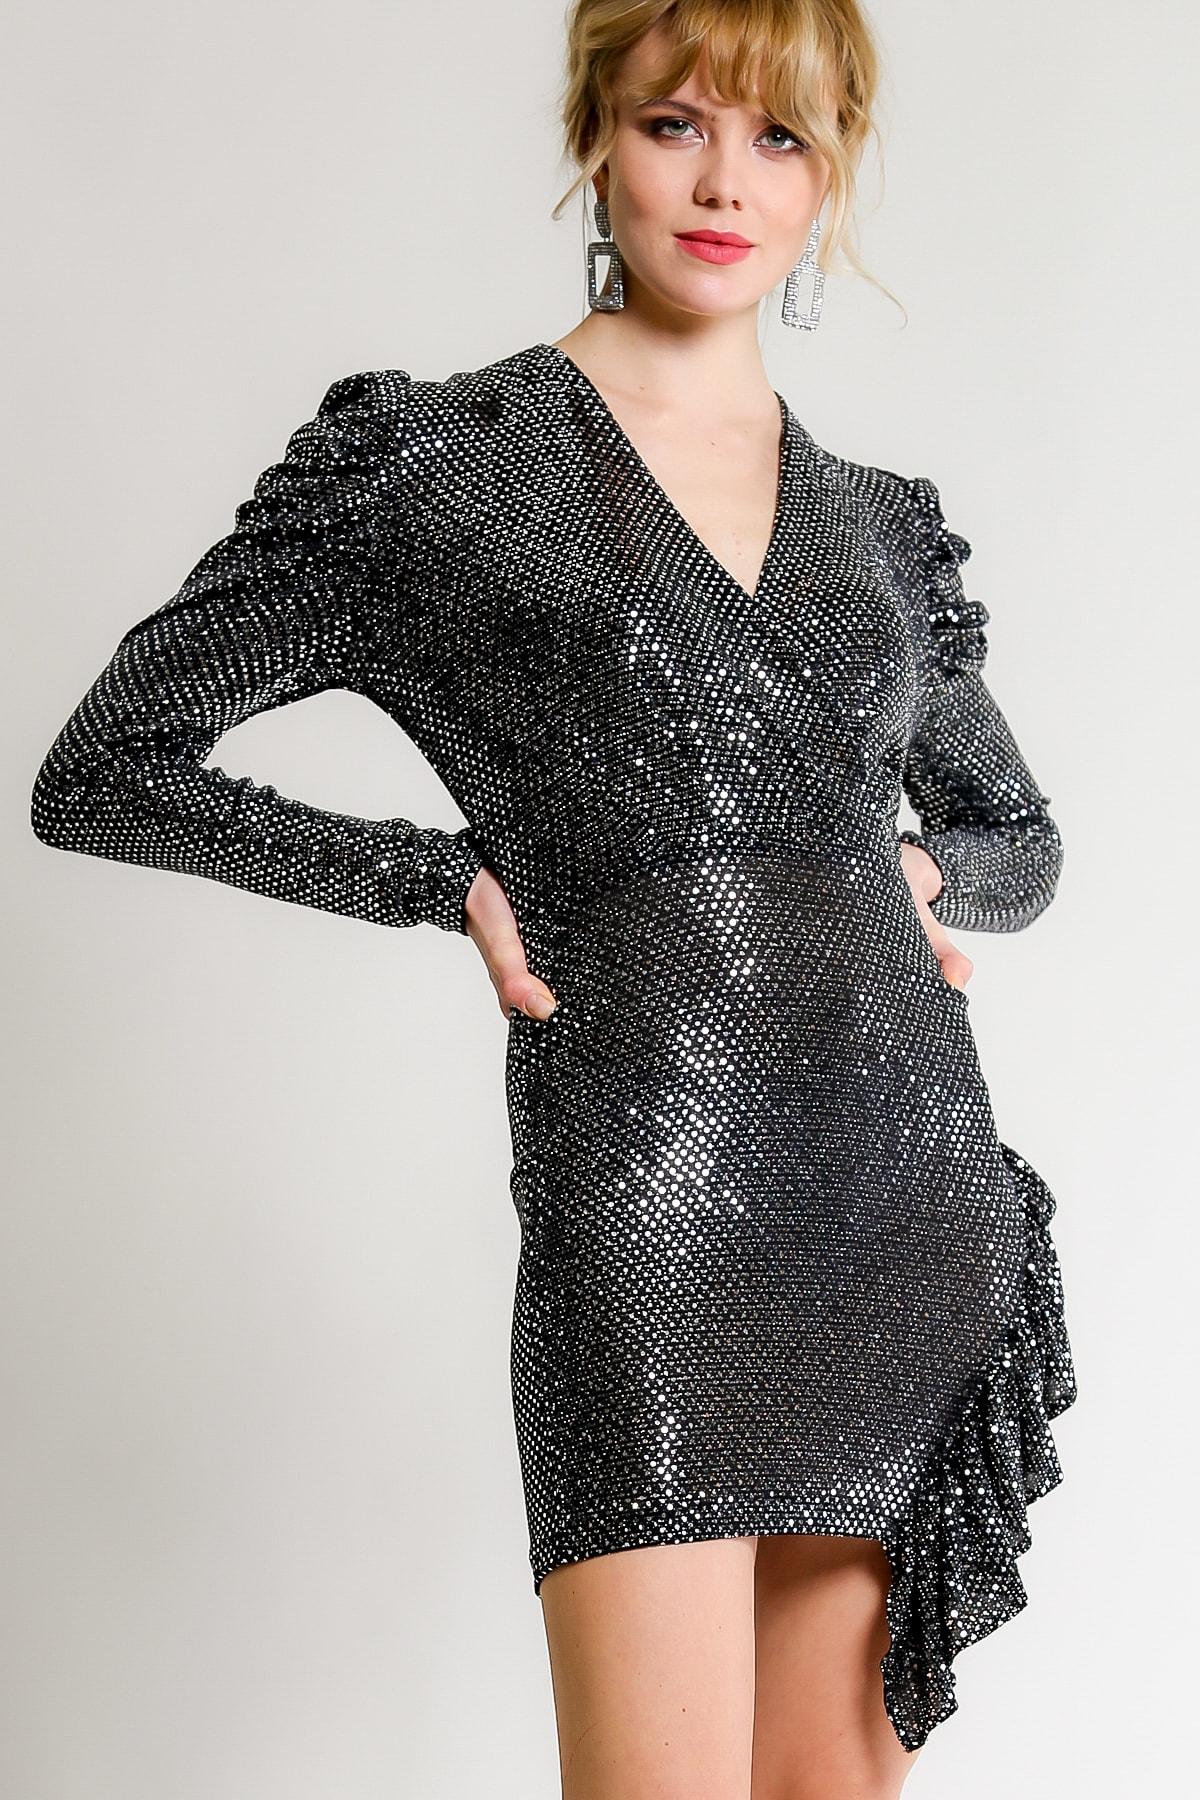 Chiccy Kadın Siyah-Gümüş Retro Kruvaze Balon Kol Fırfır Detaylı Elbise M10160000EL97453